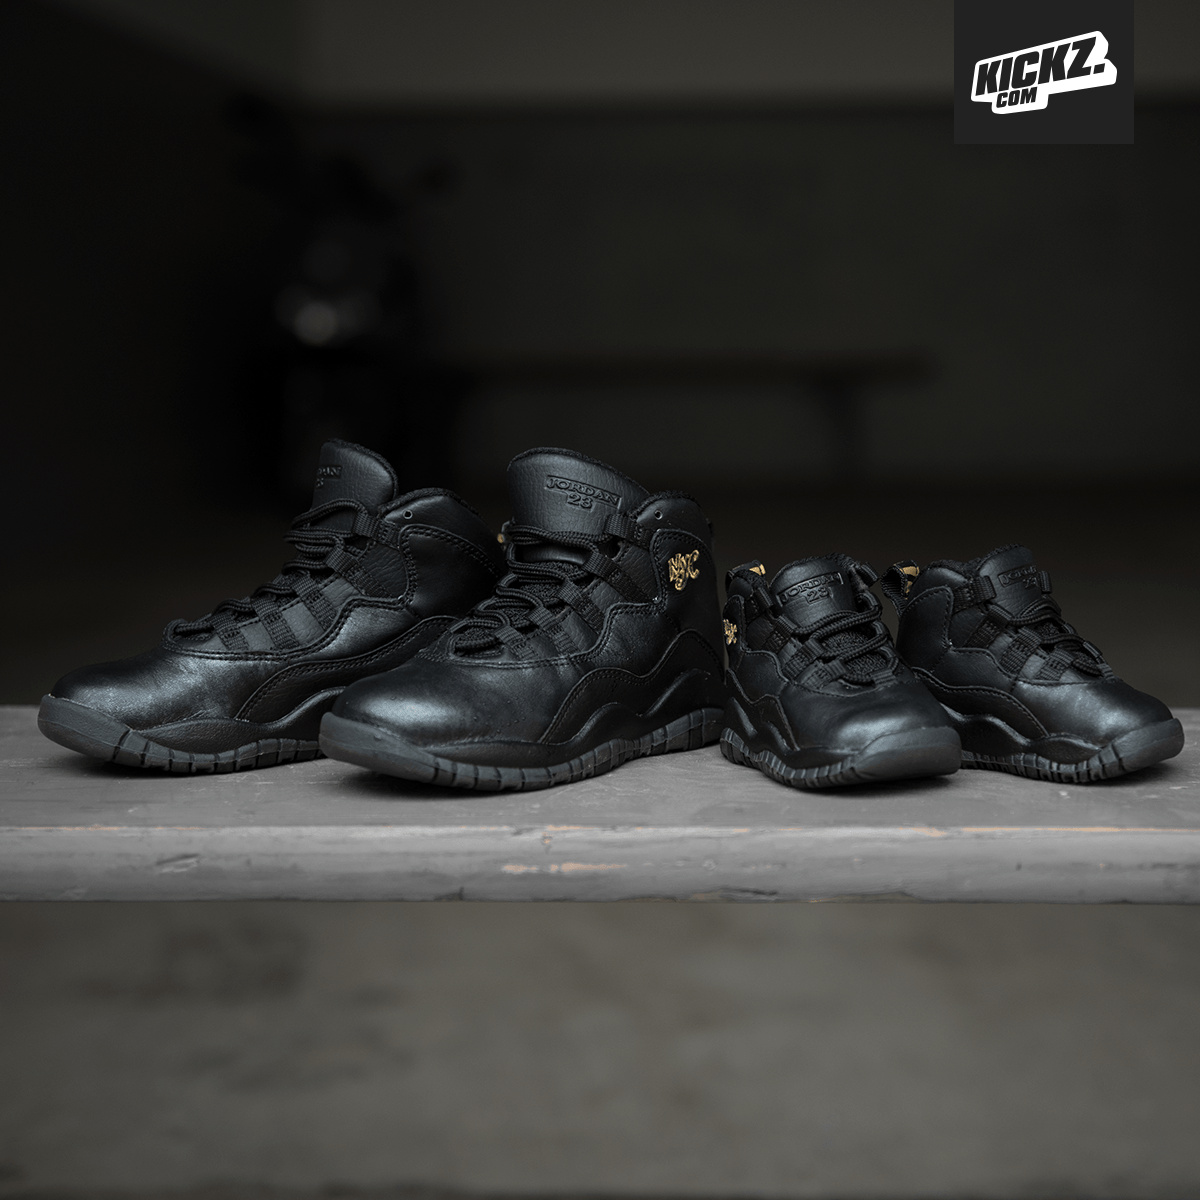 Hight Quality Nike Air Jordan 10 Stealth Black White